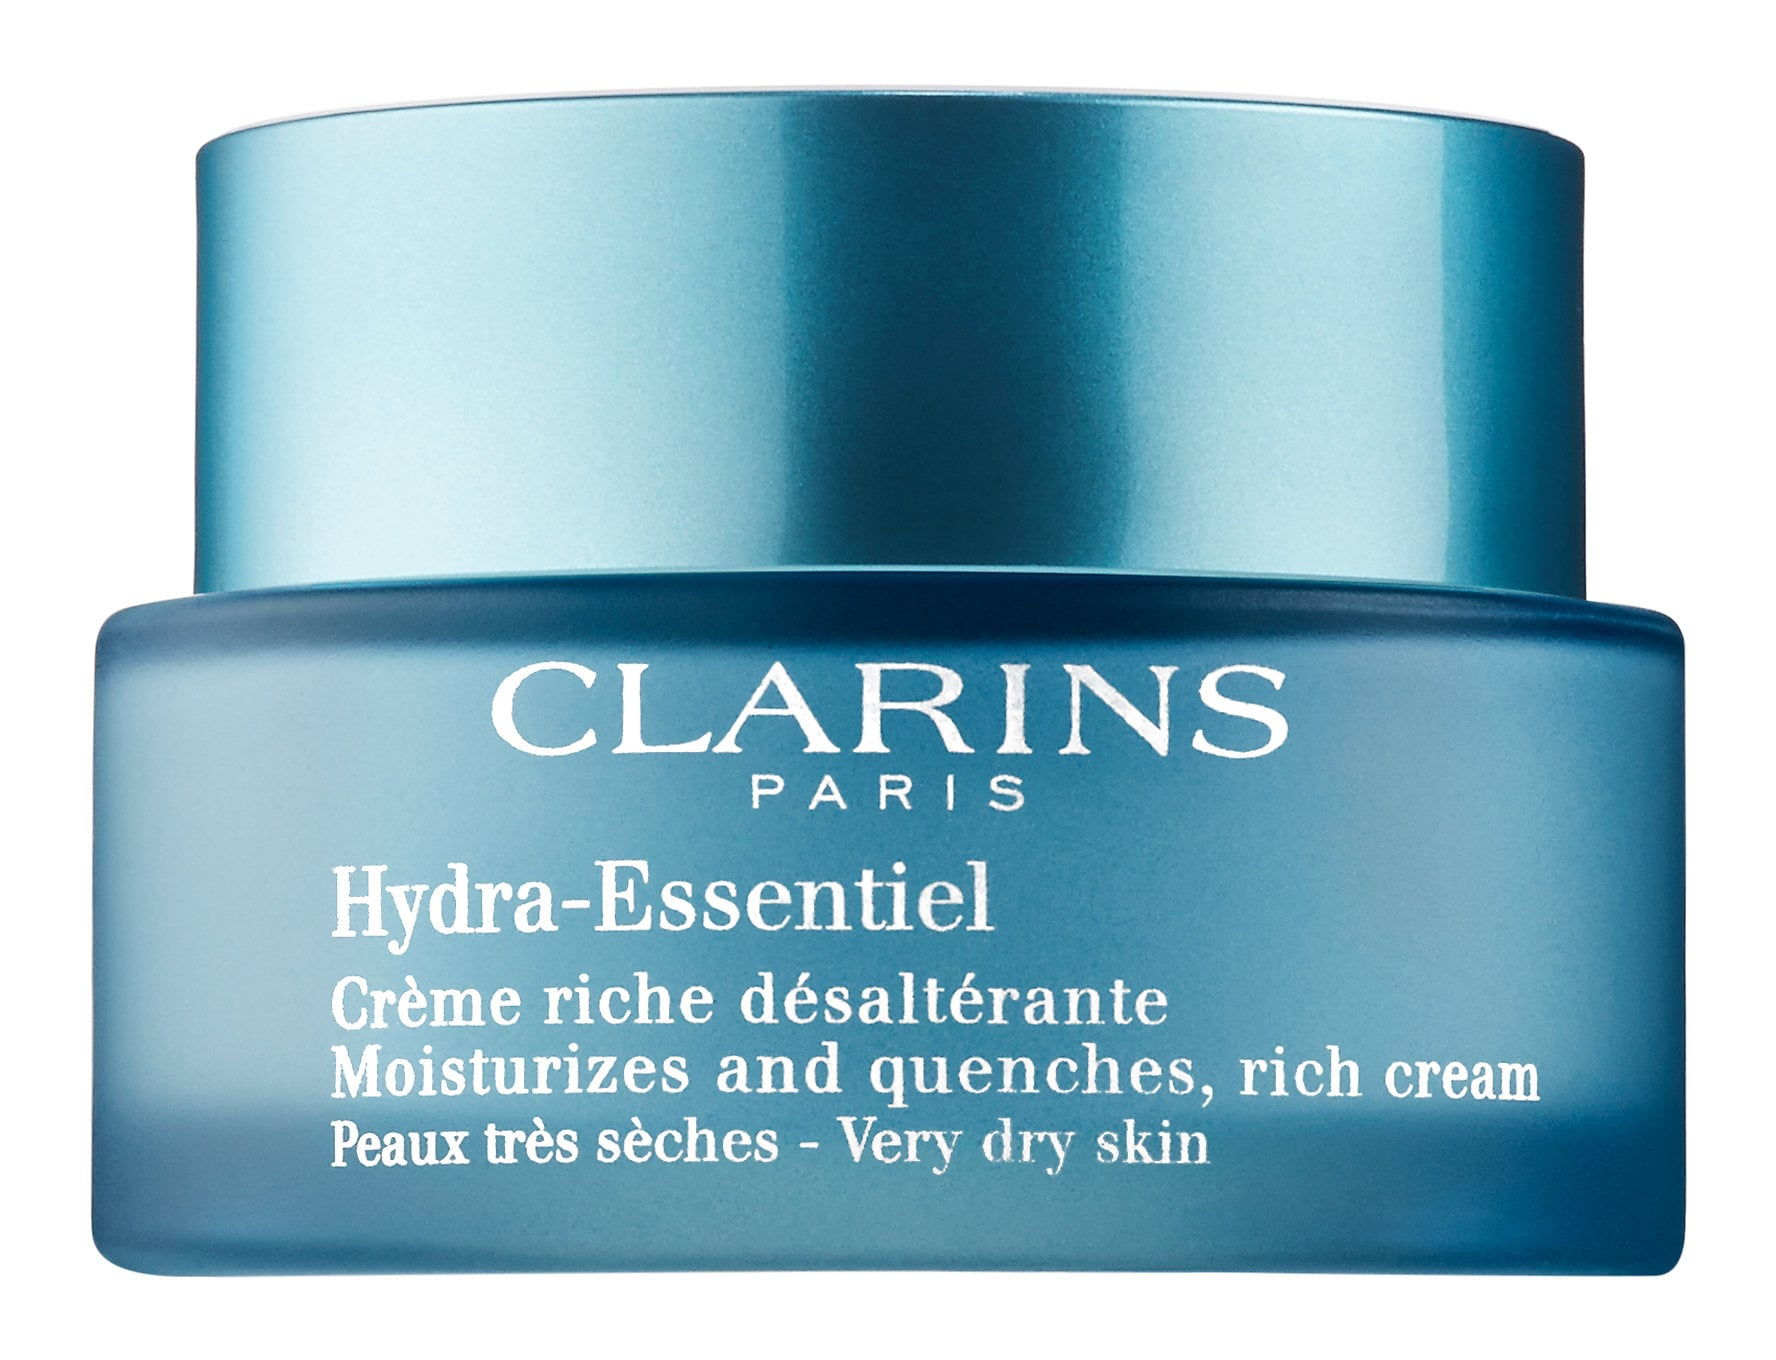 Clarins Hydra-Essentiel Cream Very Dry Skin